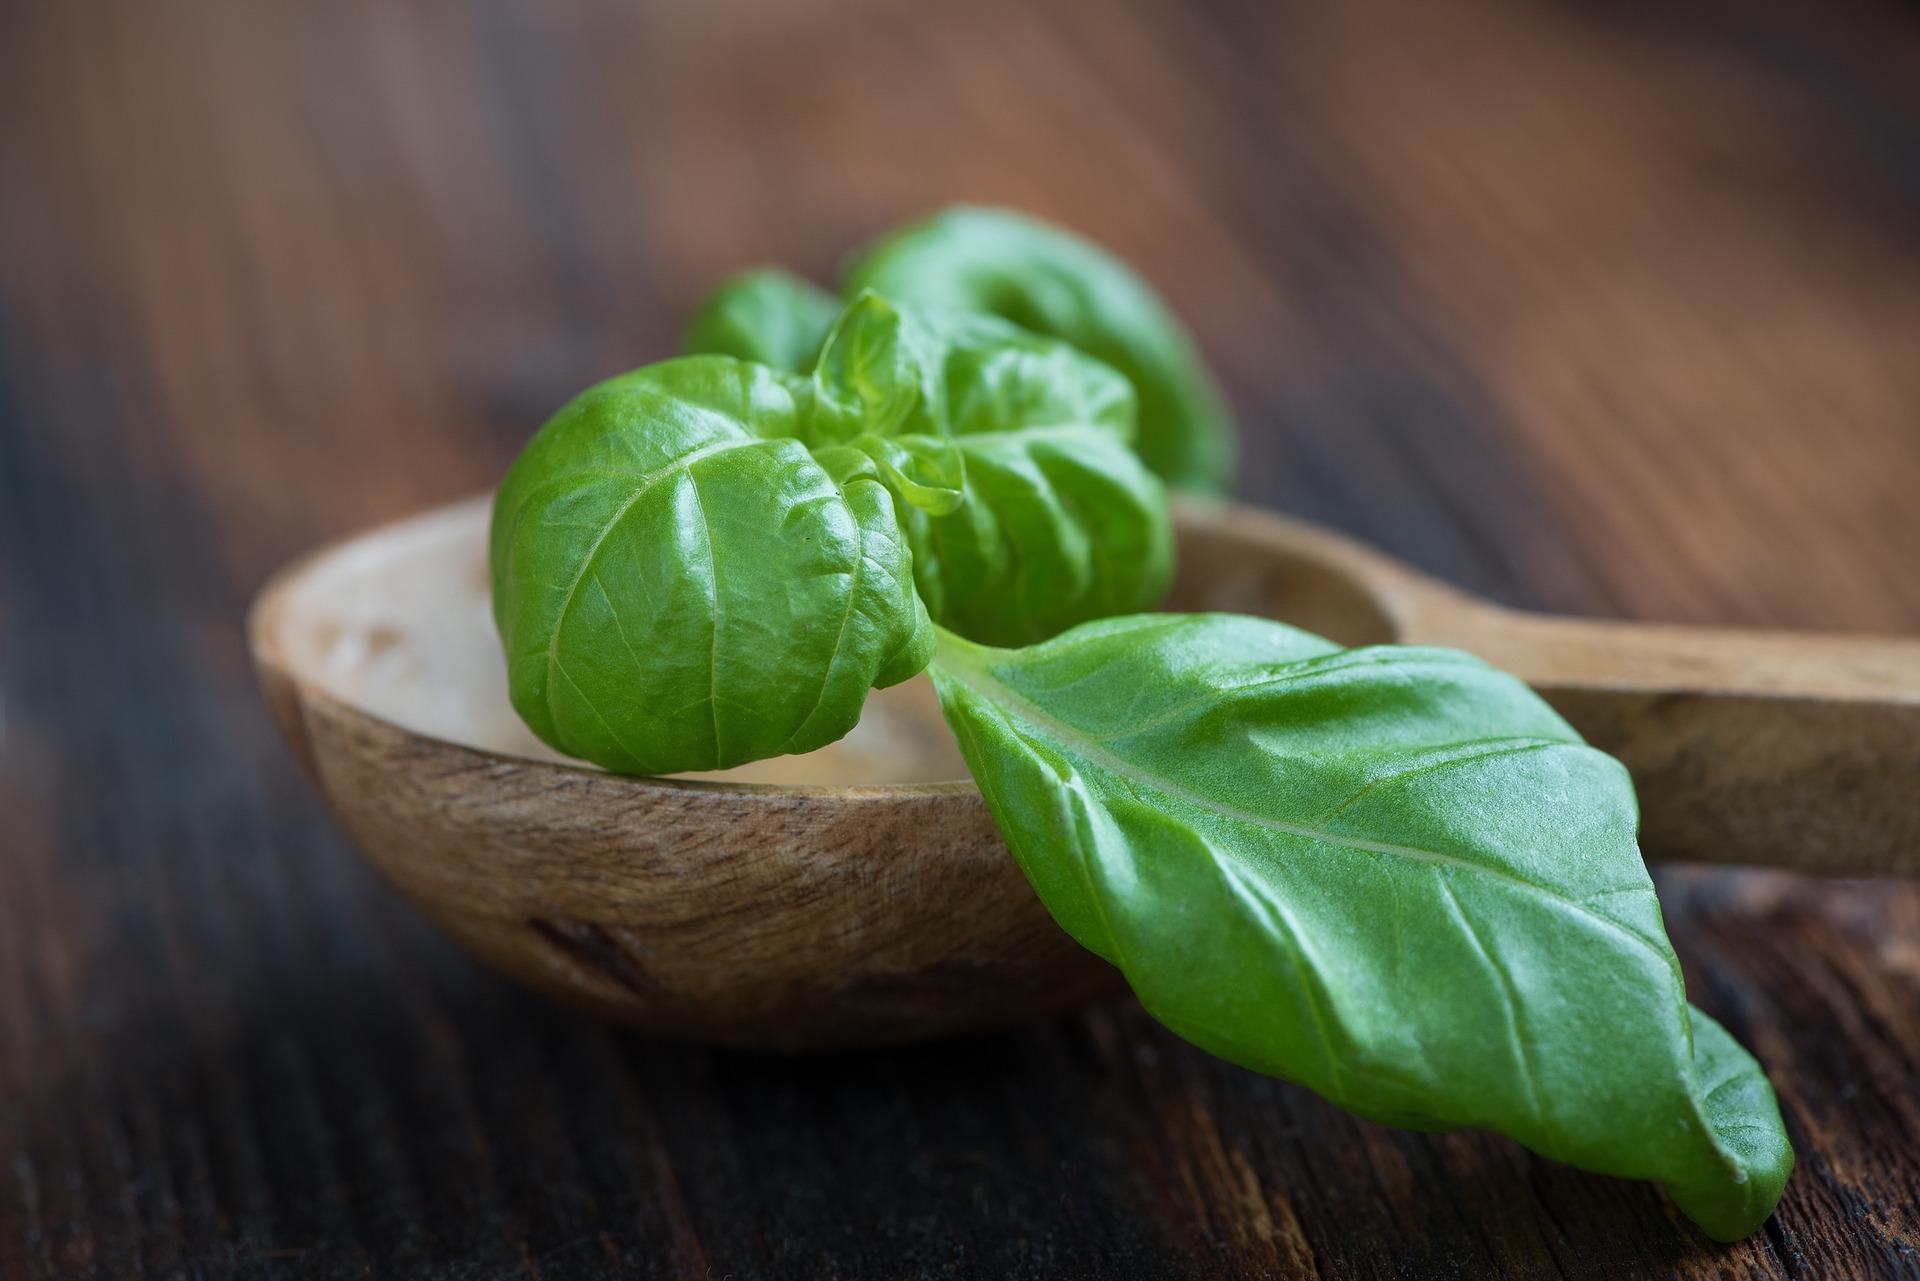 Urban farming spotlight: How to grow tasty organic basil